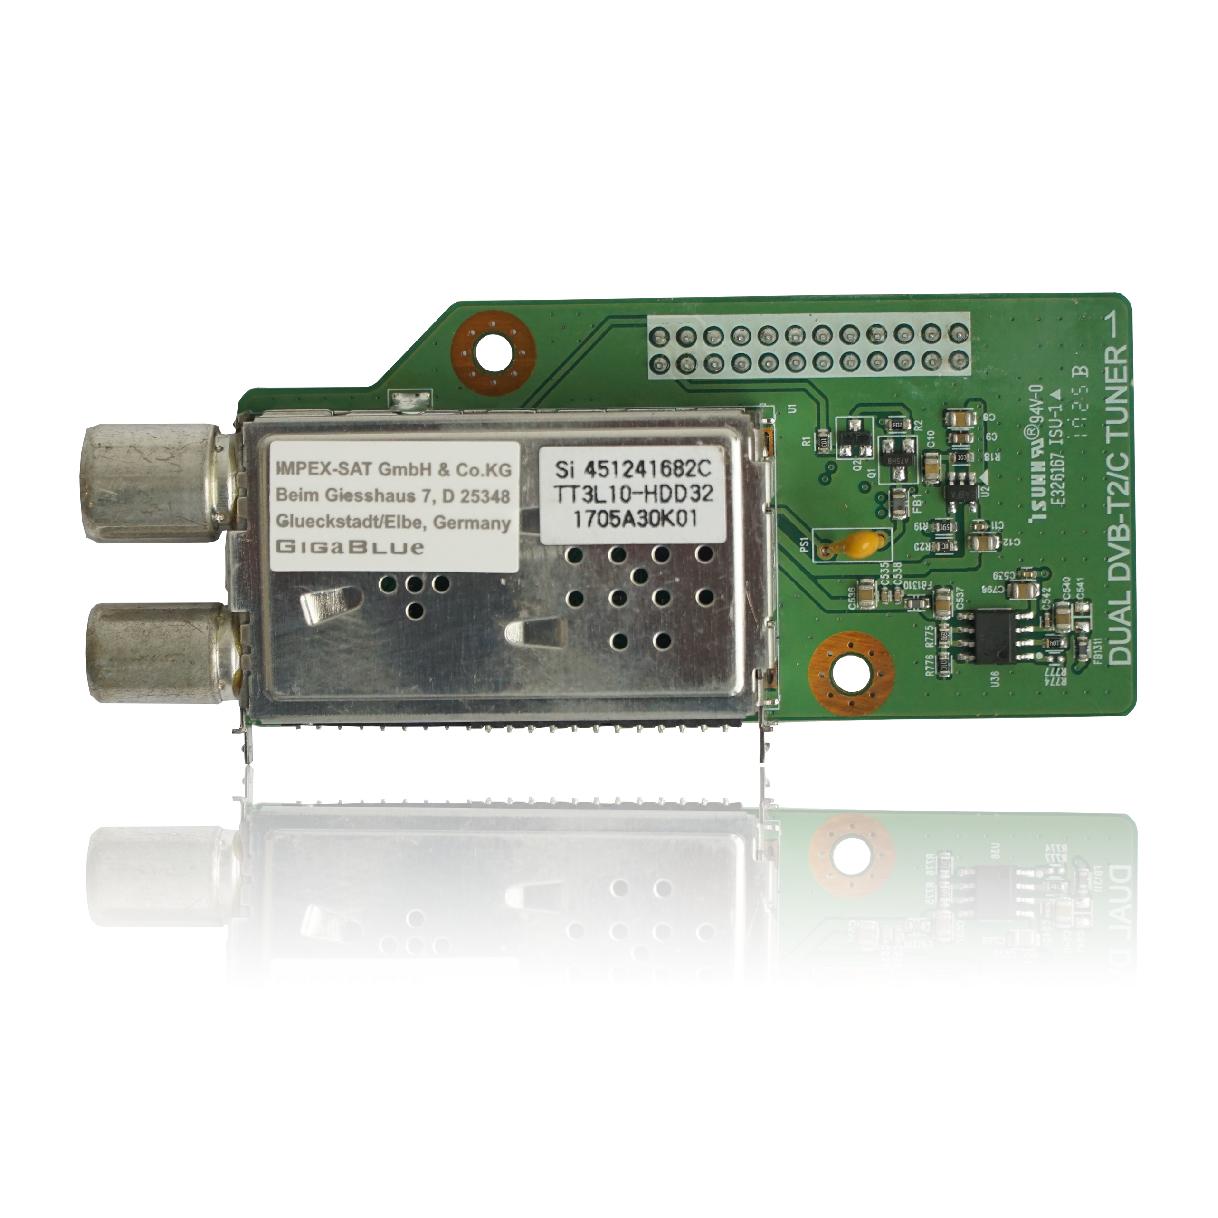 GigaBlue DVB-C/T2 Dual HD Tuner H.265 für Gigablue HD X2, UHD QUAD 4K, UE 4K, IP 4K UHD Receiver GIGZUB008